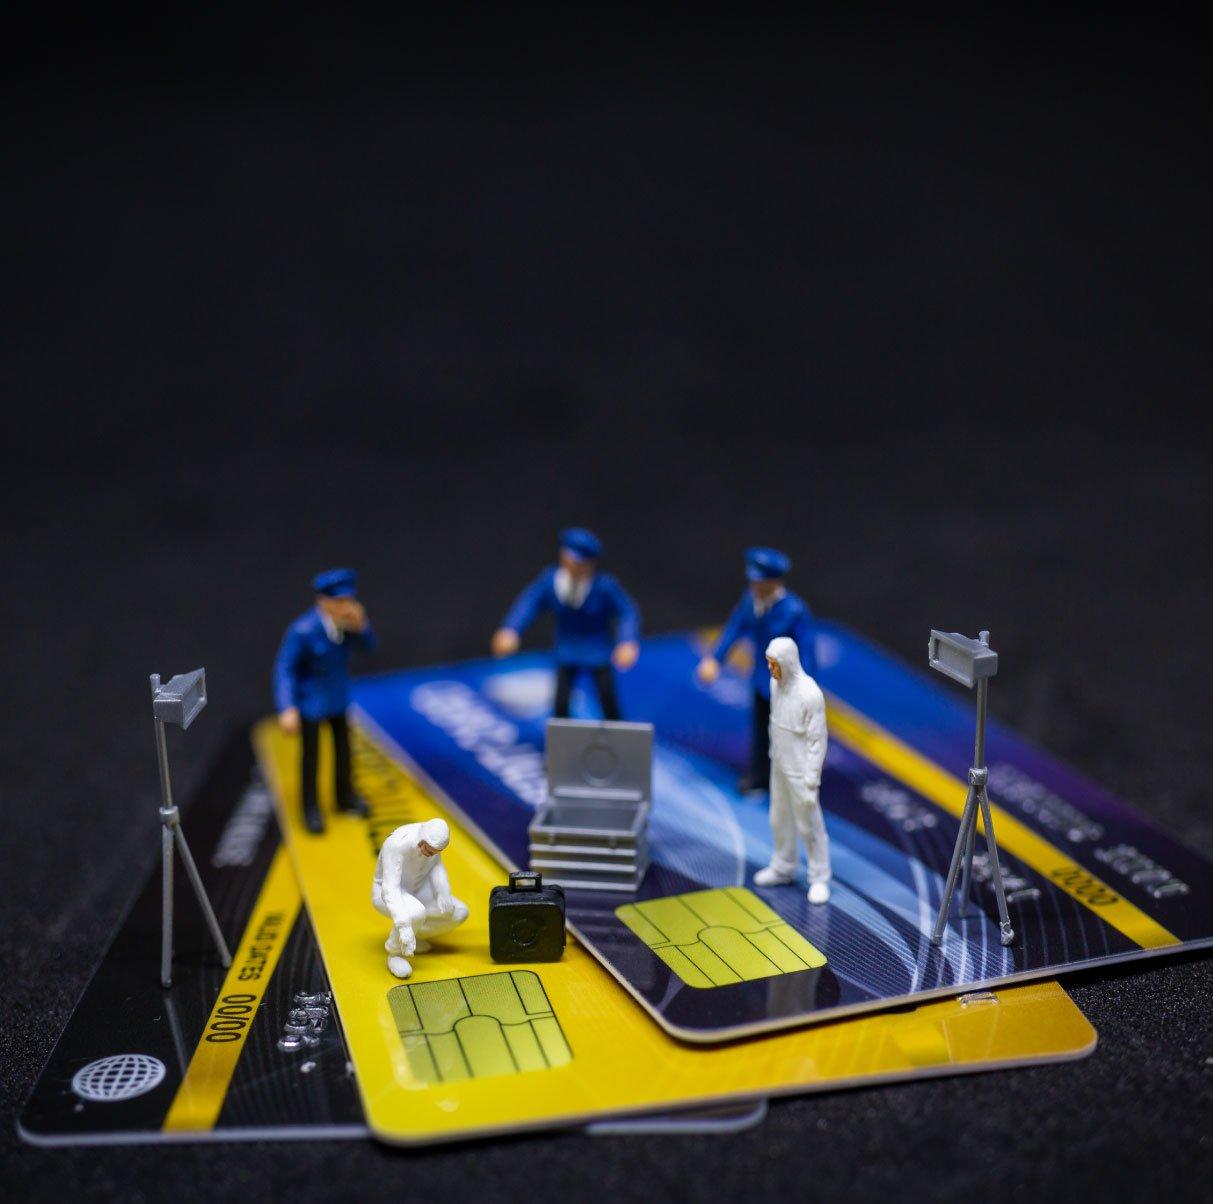 credit card fradu detection using Deep learning